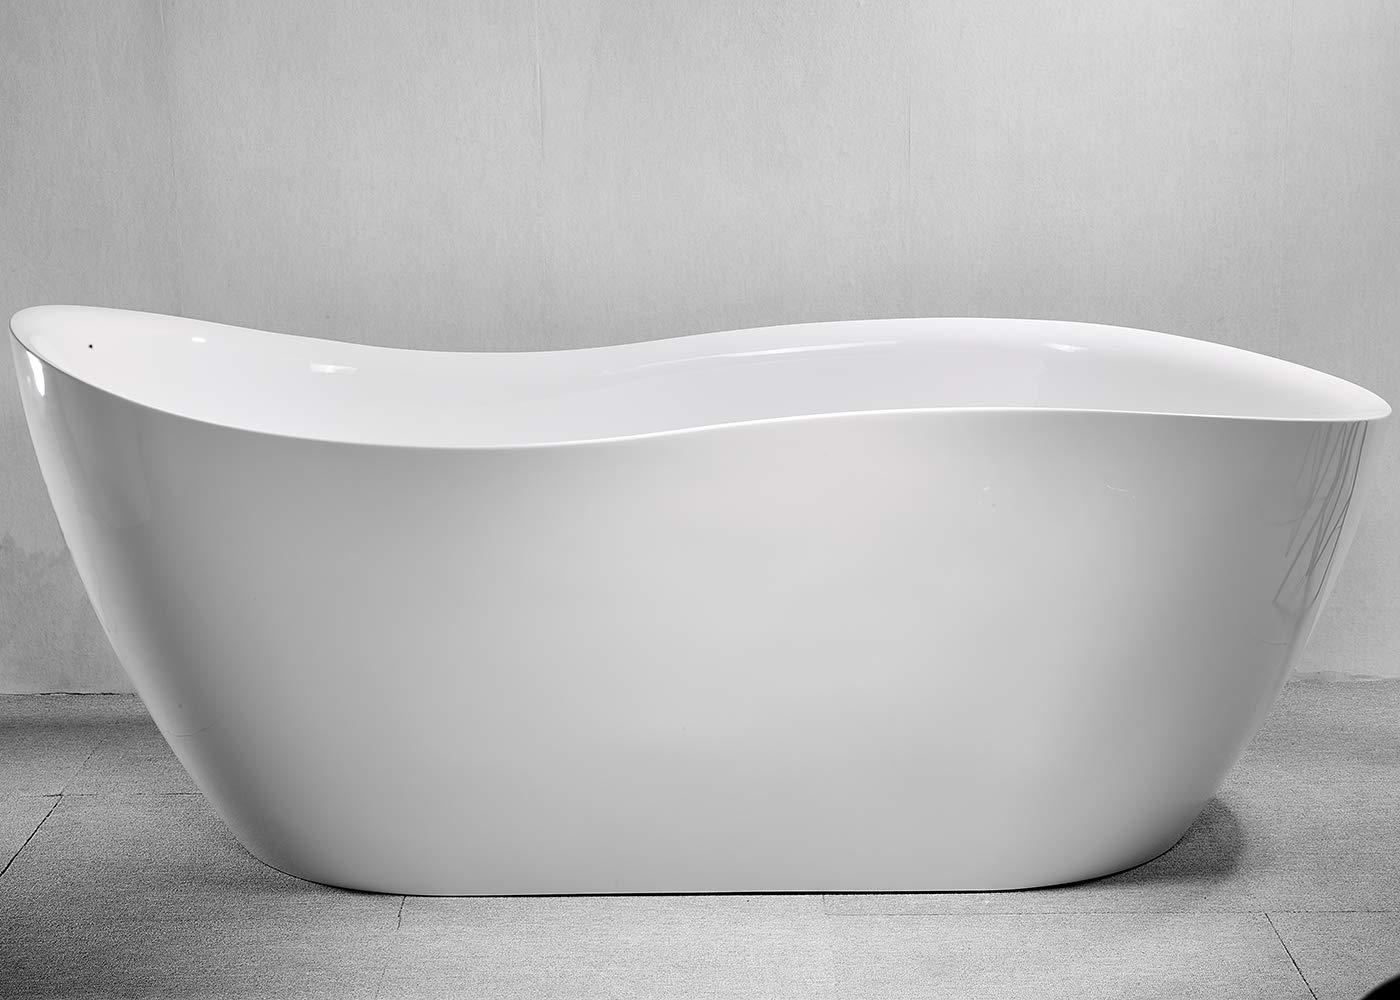 CRACCO SPA Acrylic Freestanding bathtub Soaking Bathtub, White Modern Stand Alone bathtub, Easy to Install, cUPC Certified, Drain & Overflow Assembly